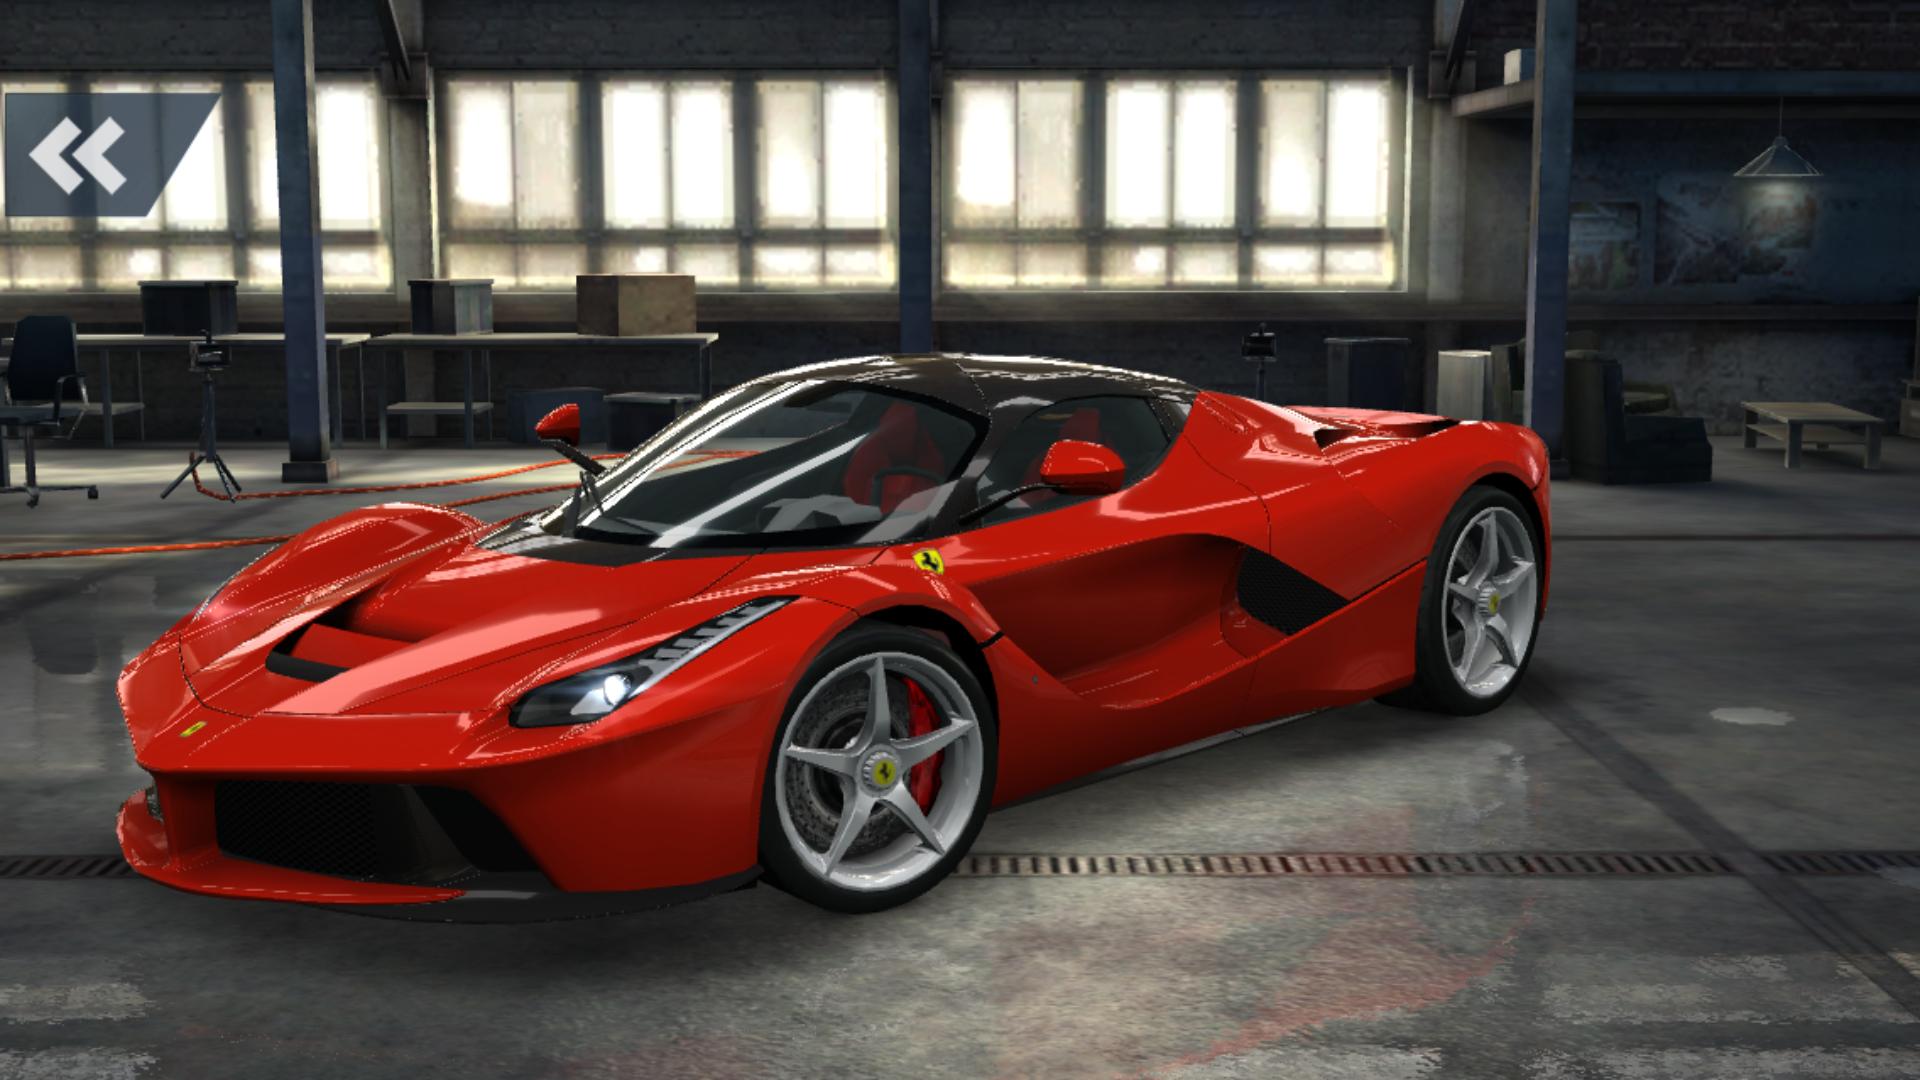 Ferrari LaFerrari | Need for Speed Wiki | FANDOM powered by Wikia